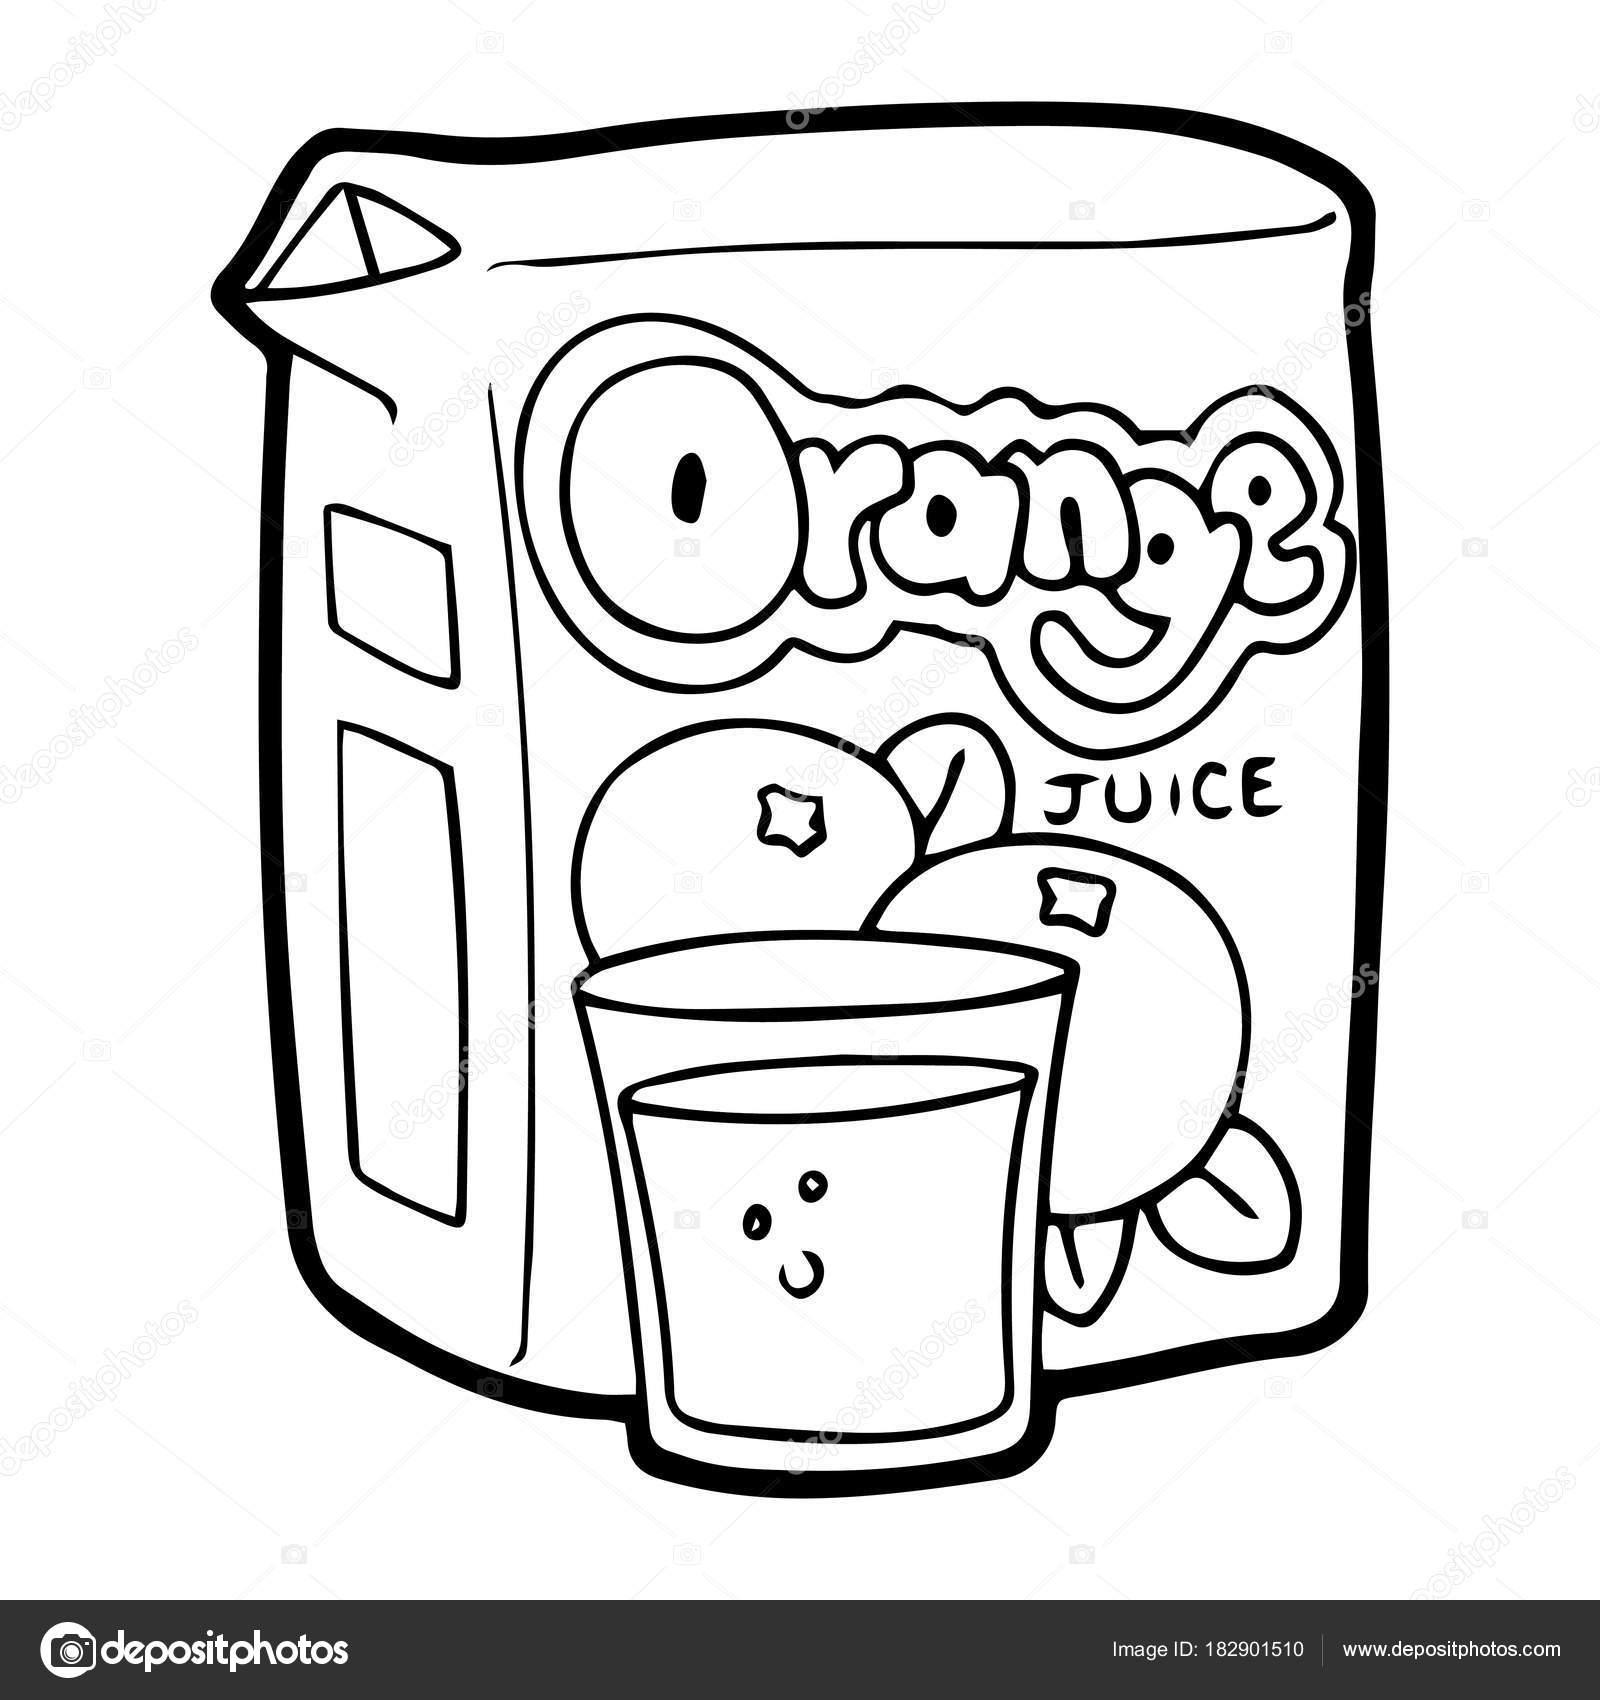 orange juice coloring pages - photo#26